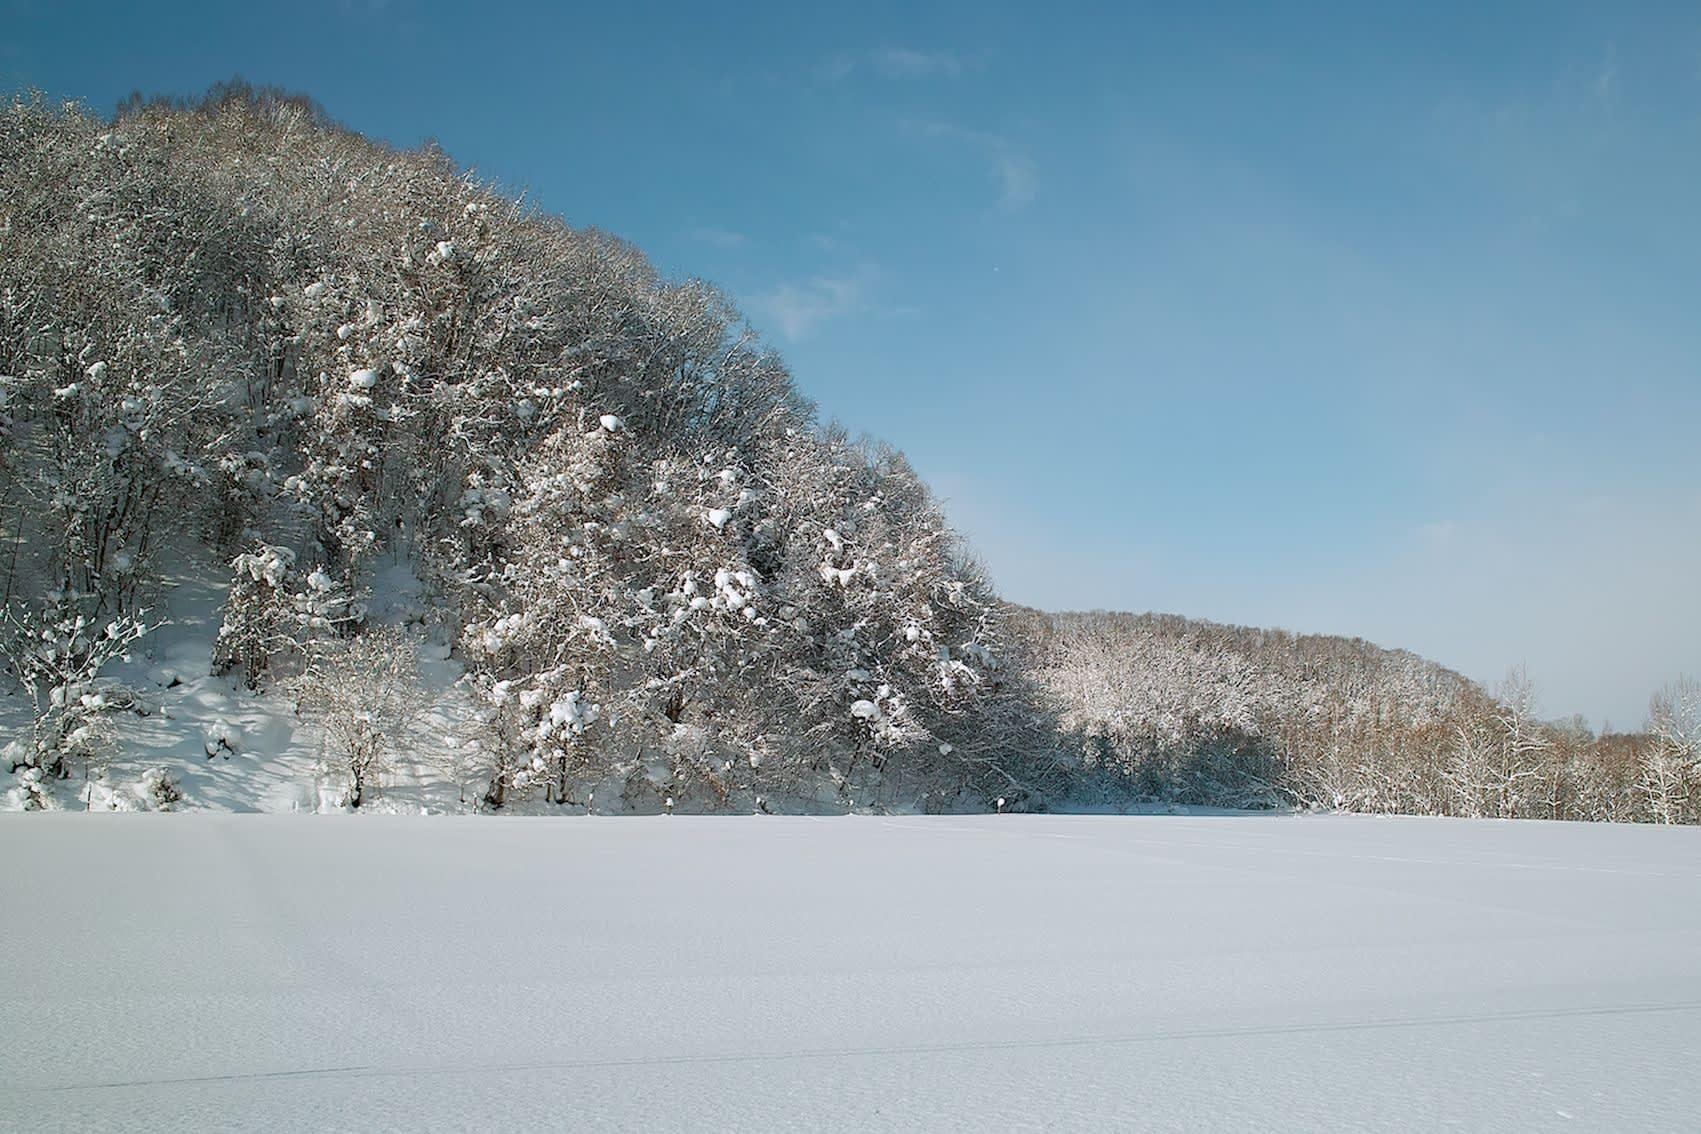 北海道道4号旭川芦別線:1月19日2019 - えぞ地(北海道)の身近な風景